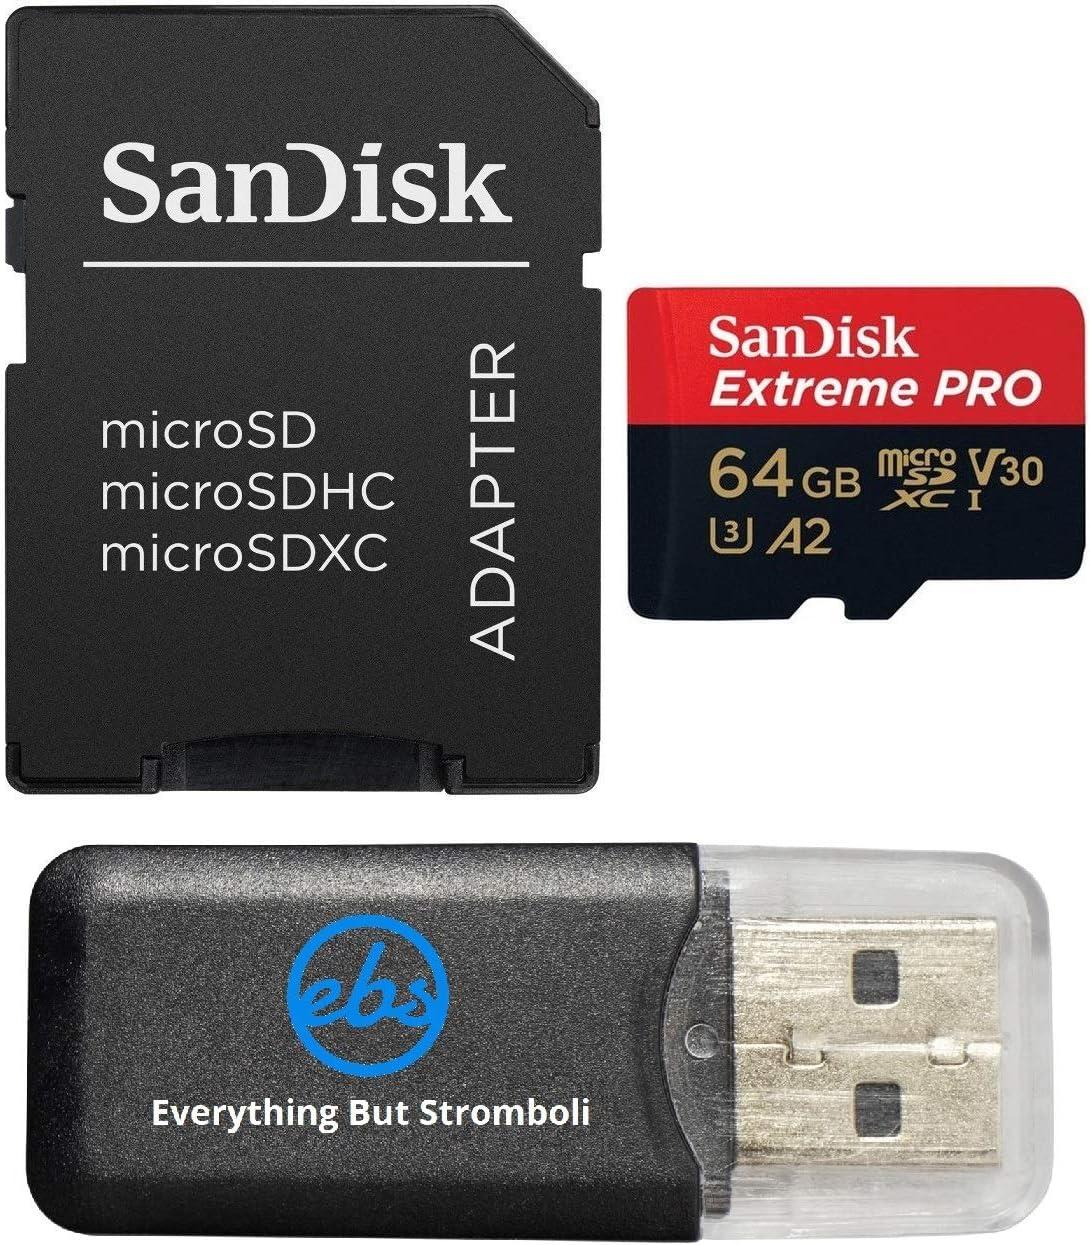 Sandisk 64GB 4326596692 Extreme Pro 4K Memory Card works with DJI Mavic Pro, Spark, Phantom 4, Phantom 3 Quadcopter 4K UHD Camera Drone - UHS-1 V30 ...